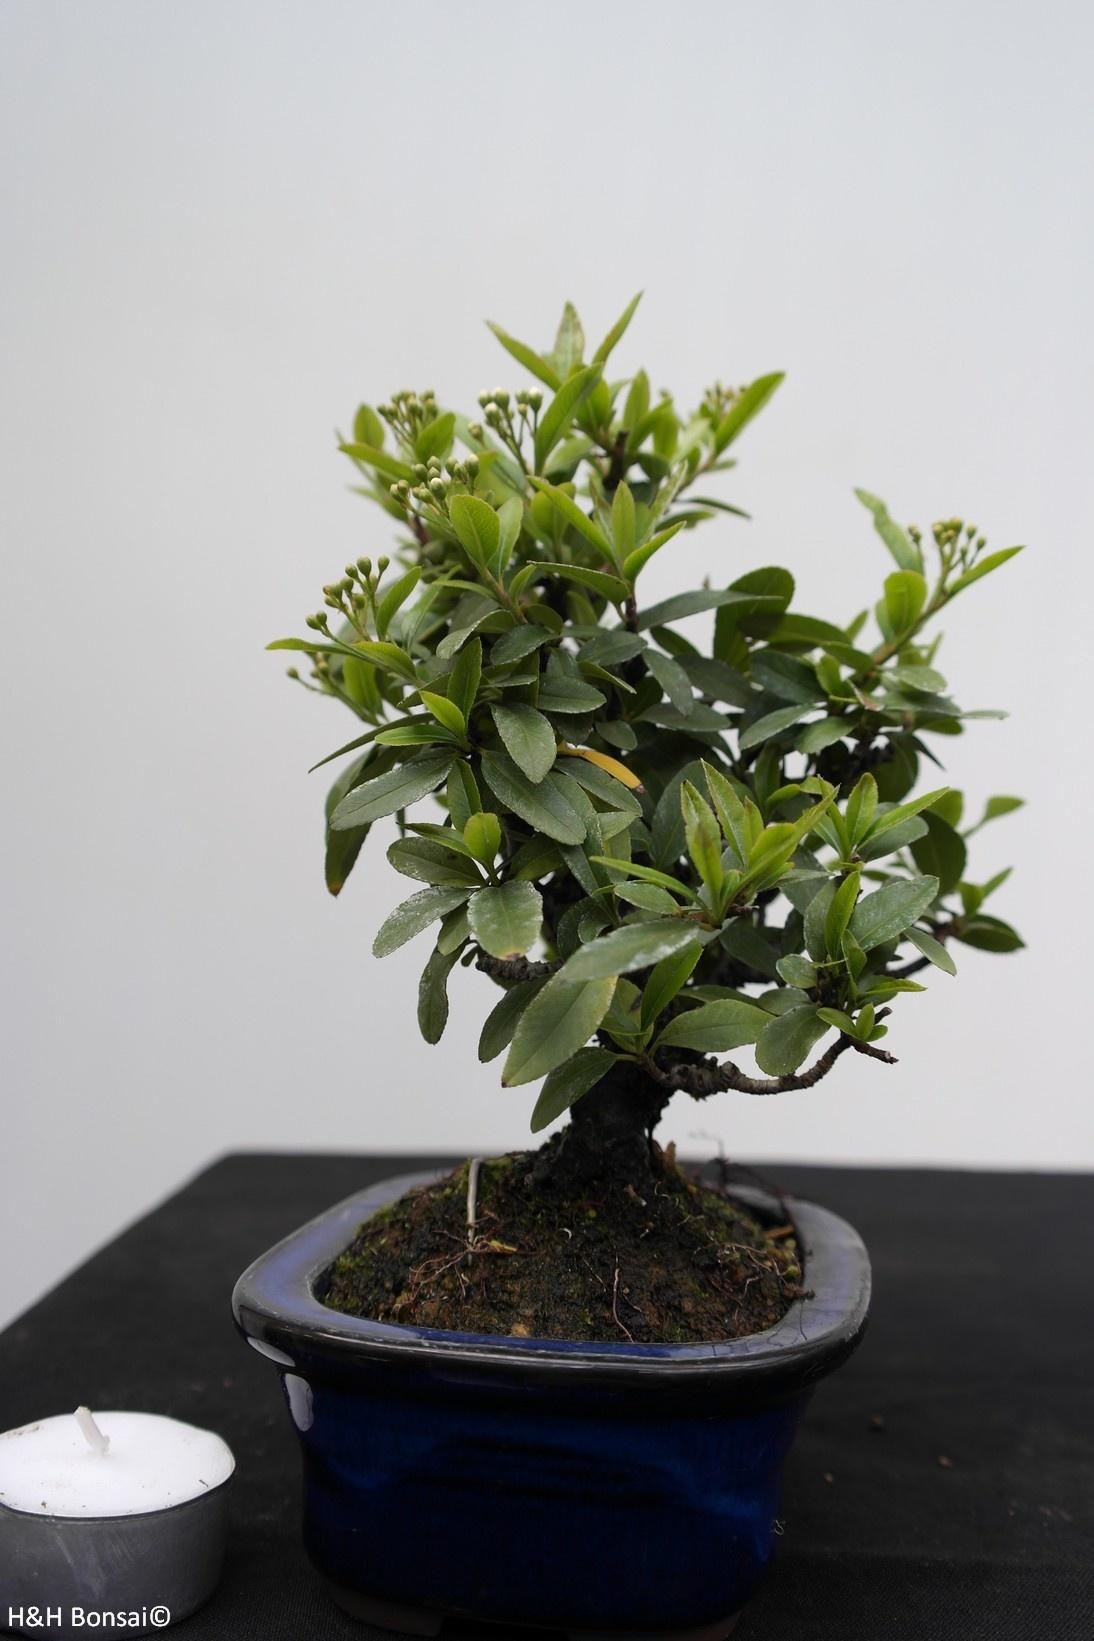 Bonsai Shohin Buisson ardent,Pyracantha, no. 7785